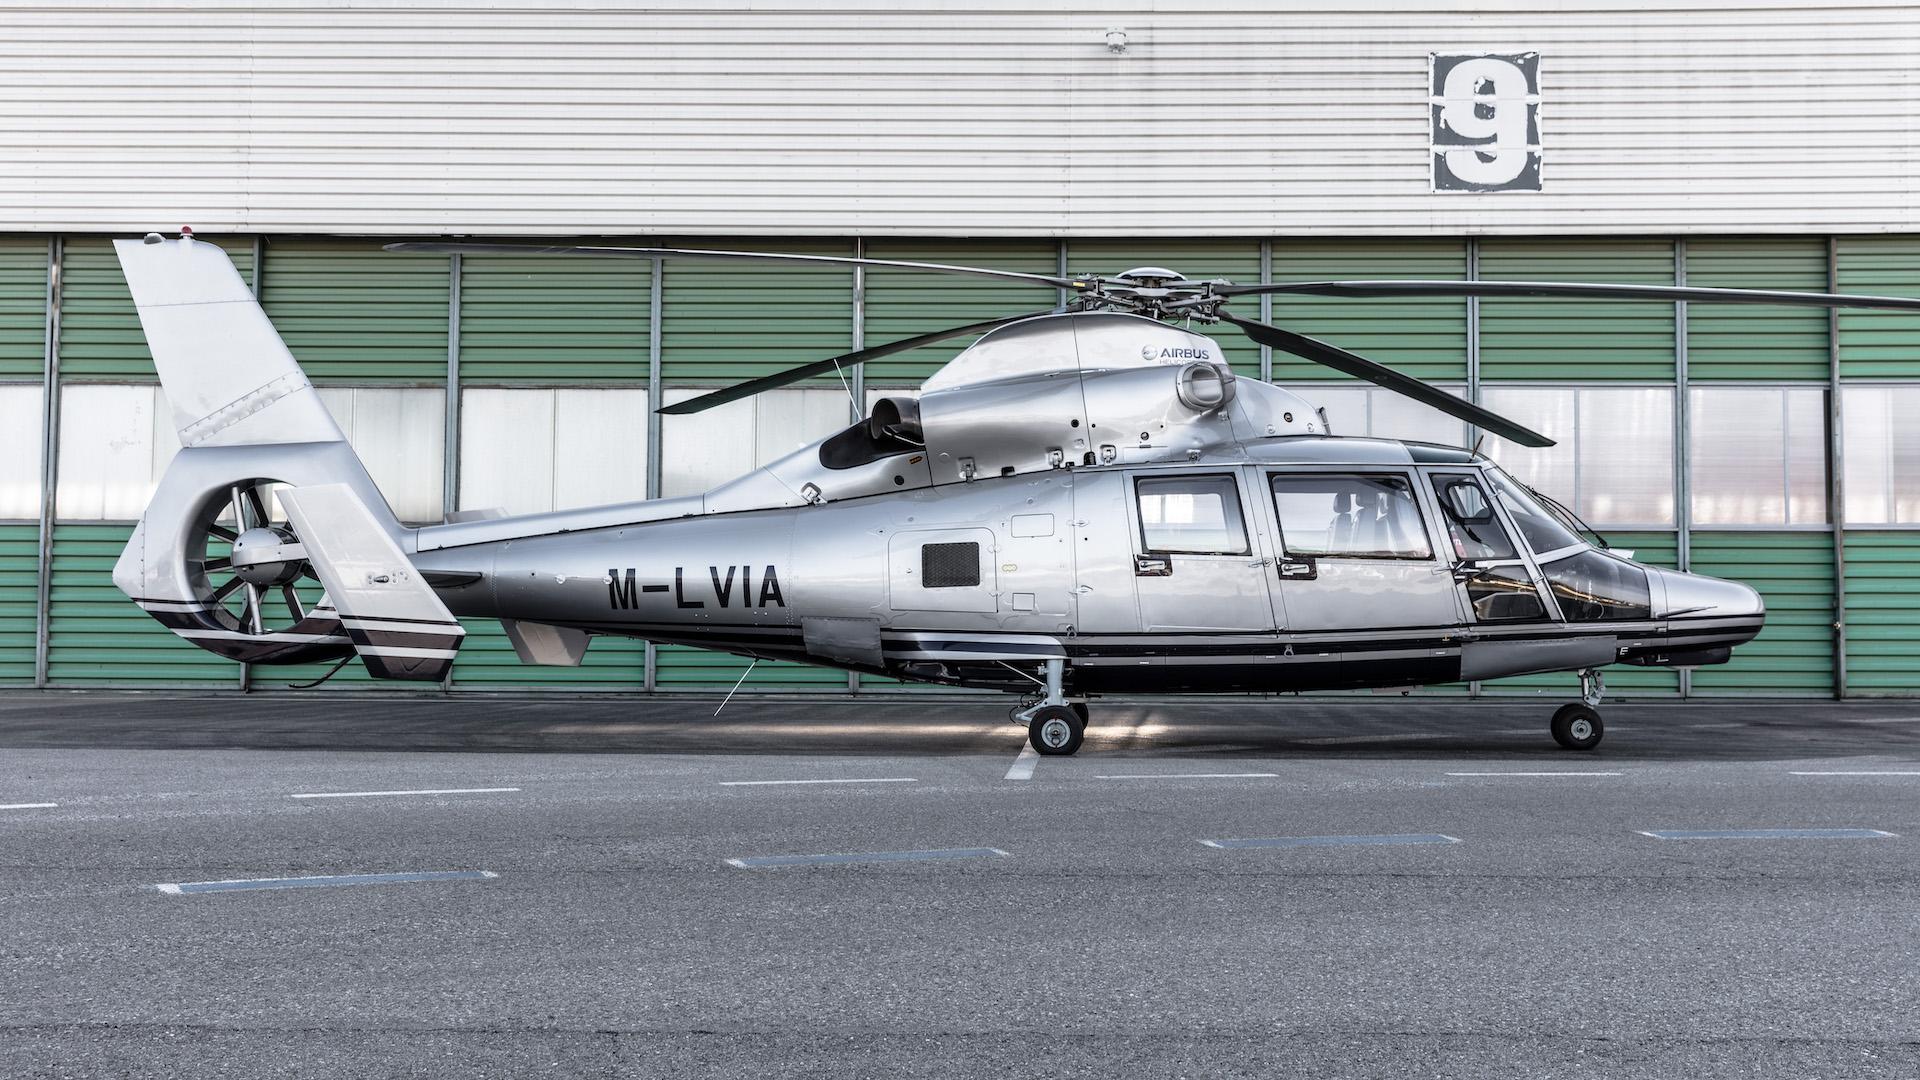 M-LVIA Eurocopter Airbus AS 365 N3